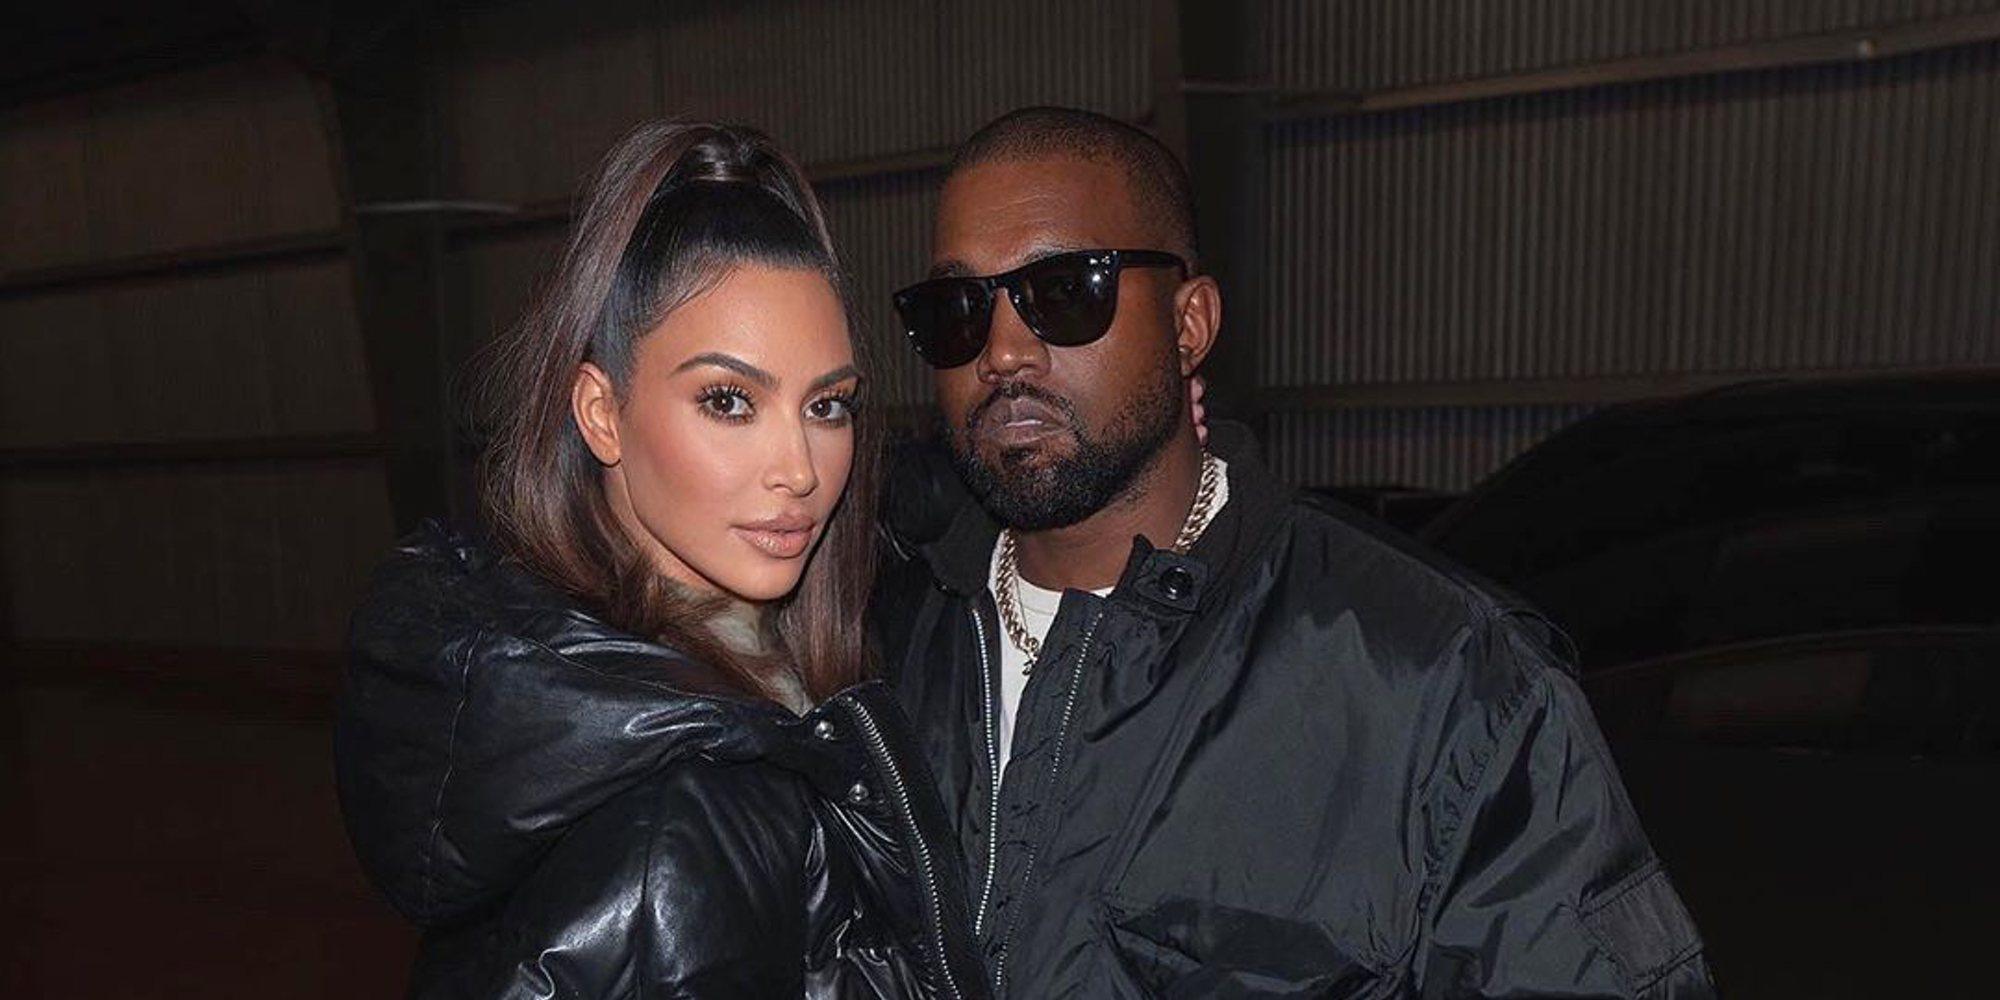 Tú a Wyoming y yo a Los Ángeles: Kim Kardashian y Kanye West vuelven a vivir separados